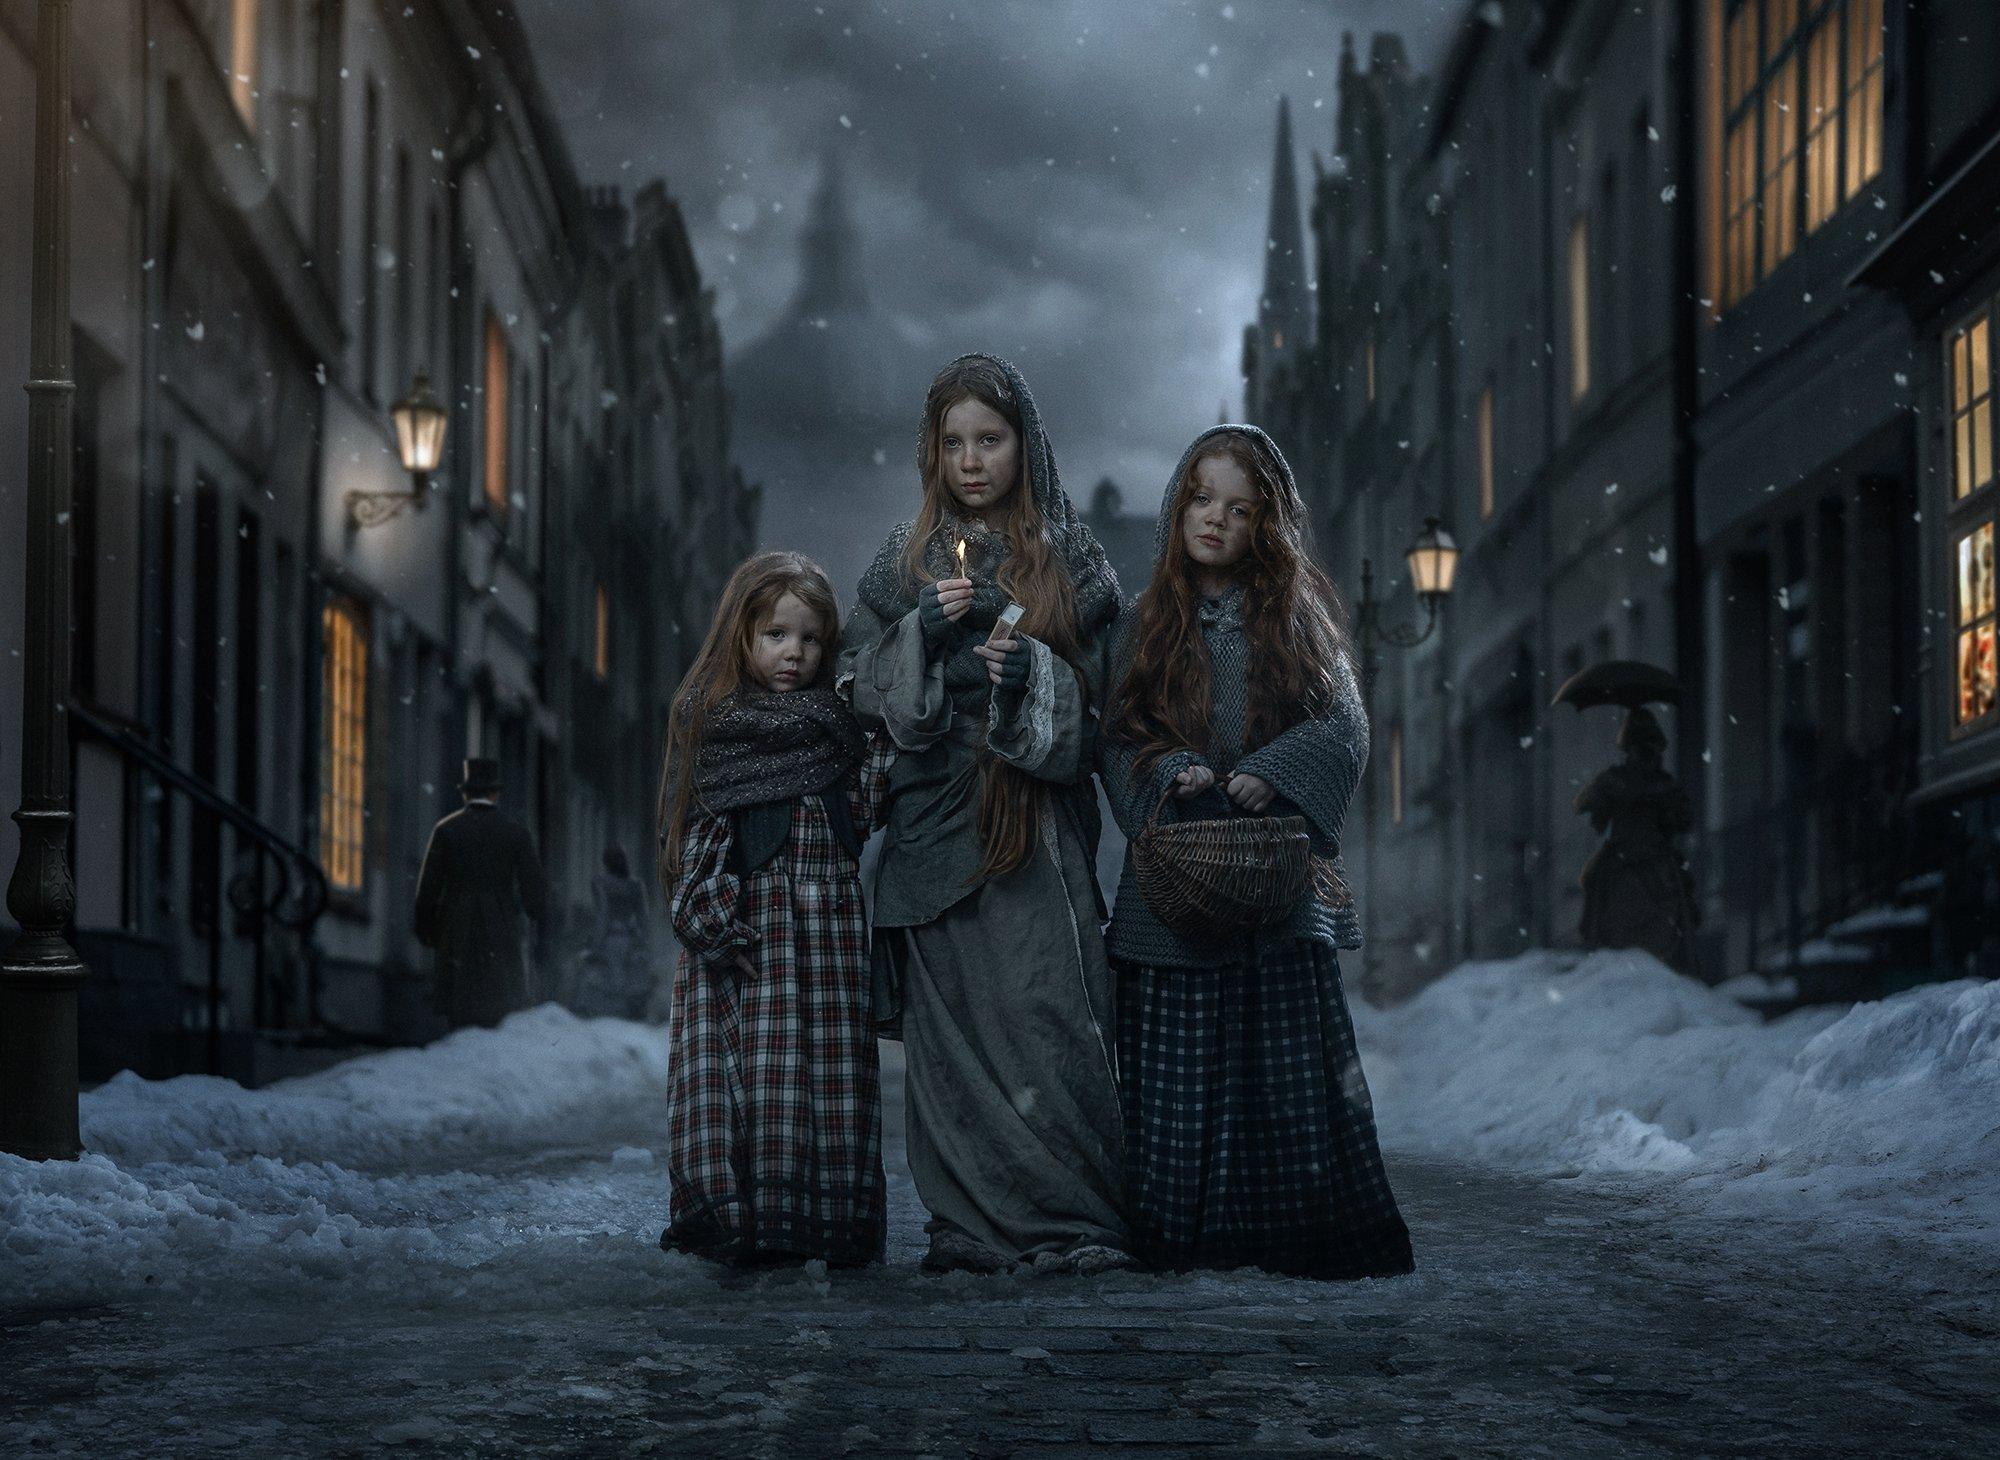 dark,mood,portrait,girls,little,match,night,snow,cold,freeze,fairy,tale,old,victorian,city,town,street,three,dirty,fairy tale, Koch Przemyslaw